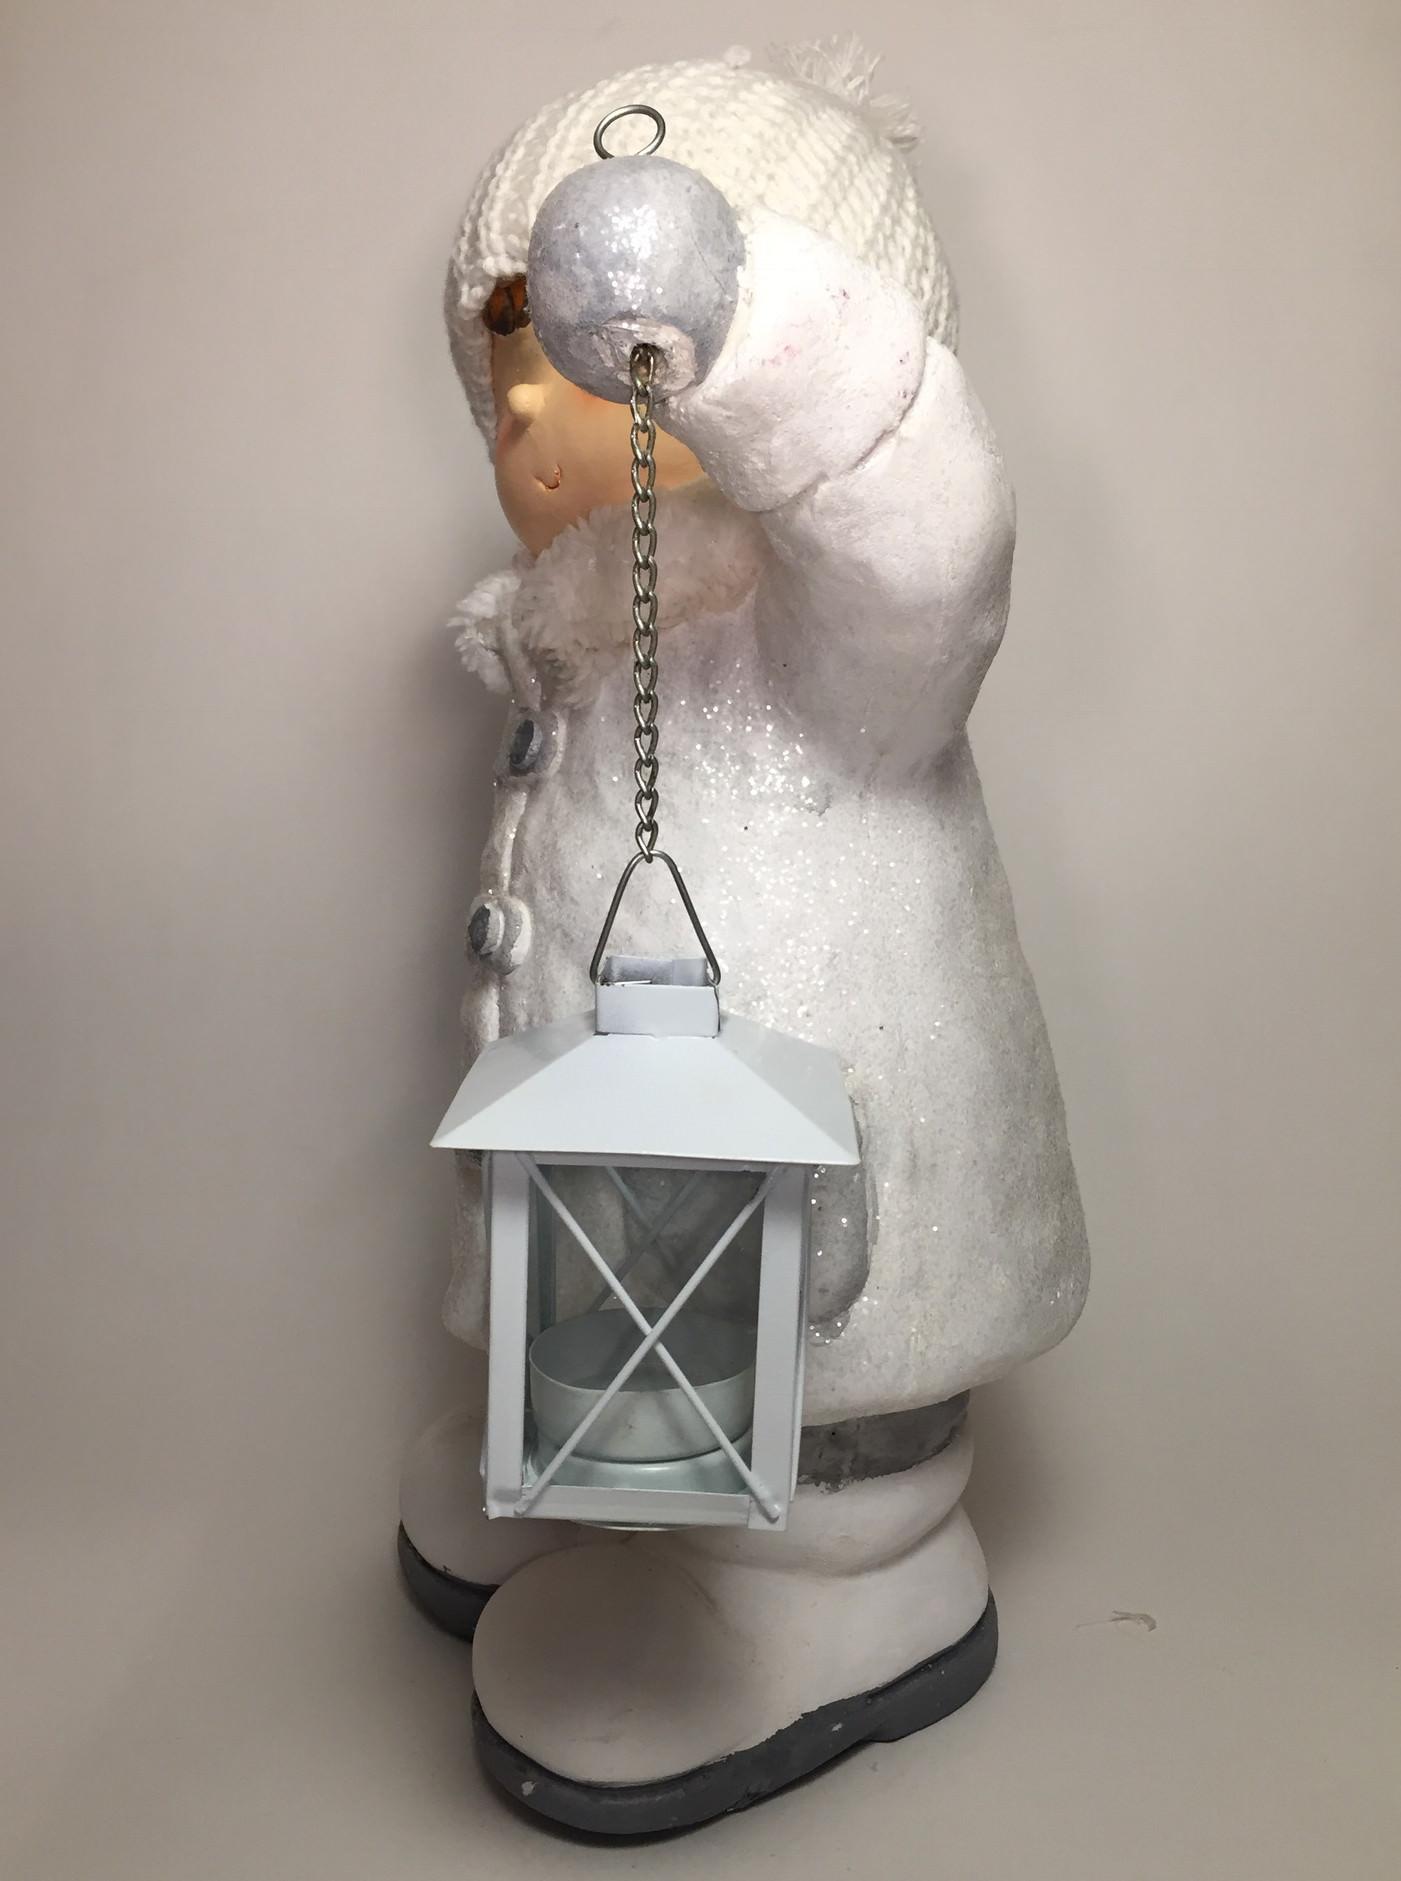 deko winterkinder mit laterne winterfigur dekofigur goldbach 38cm wei magnesia. Black Bedroom Furniture Sets. Home Design Ideas